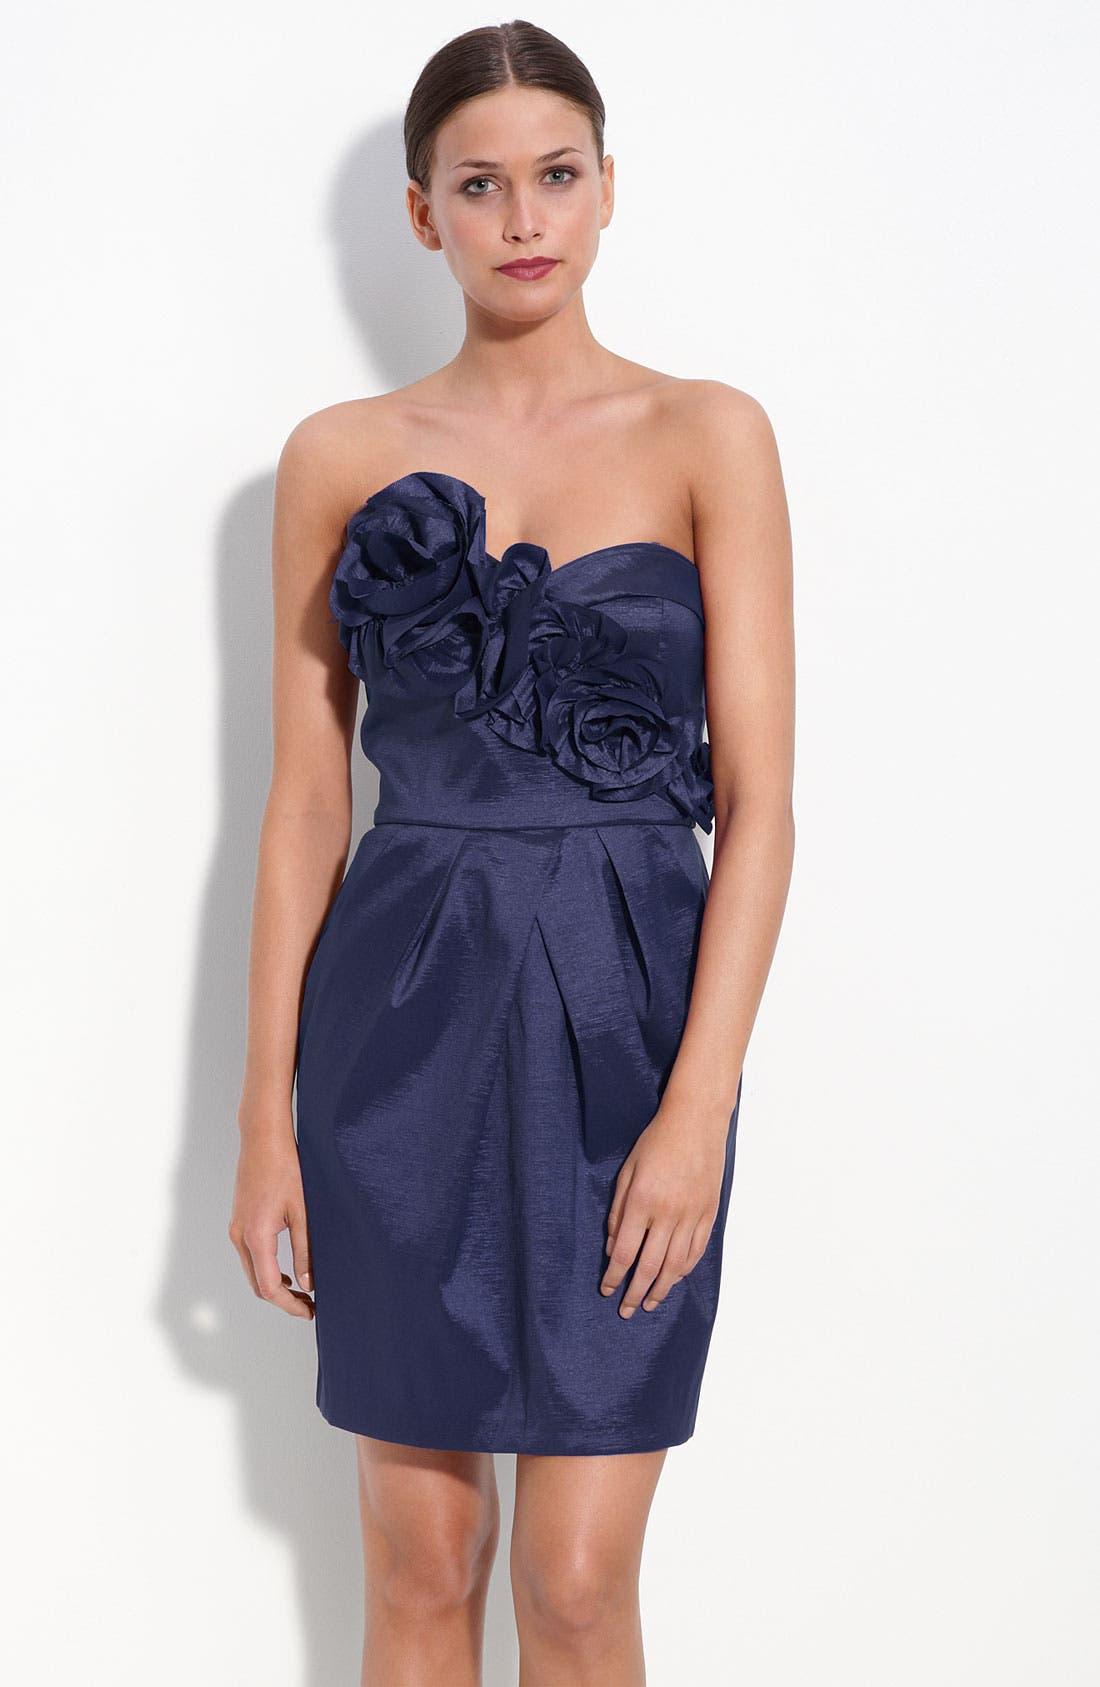 Alternate Image 1 Selected - Max & Cleo Rosette Trim Strapless Taffeta Dress